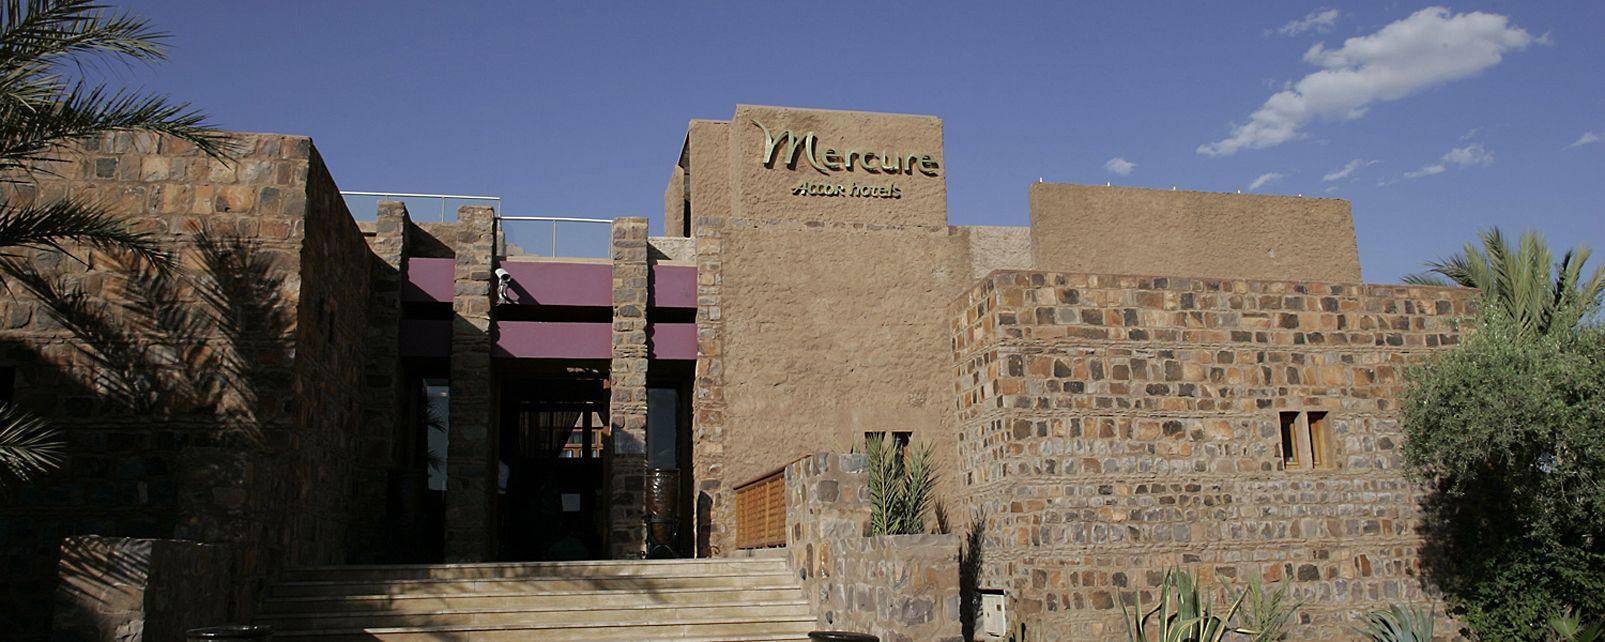 Hôtel Mercure